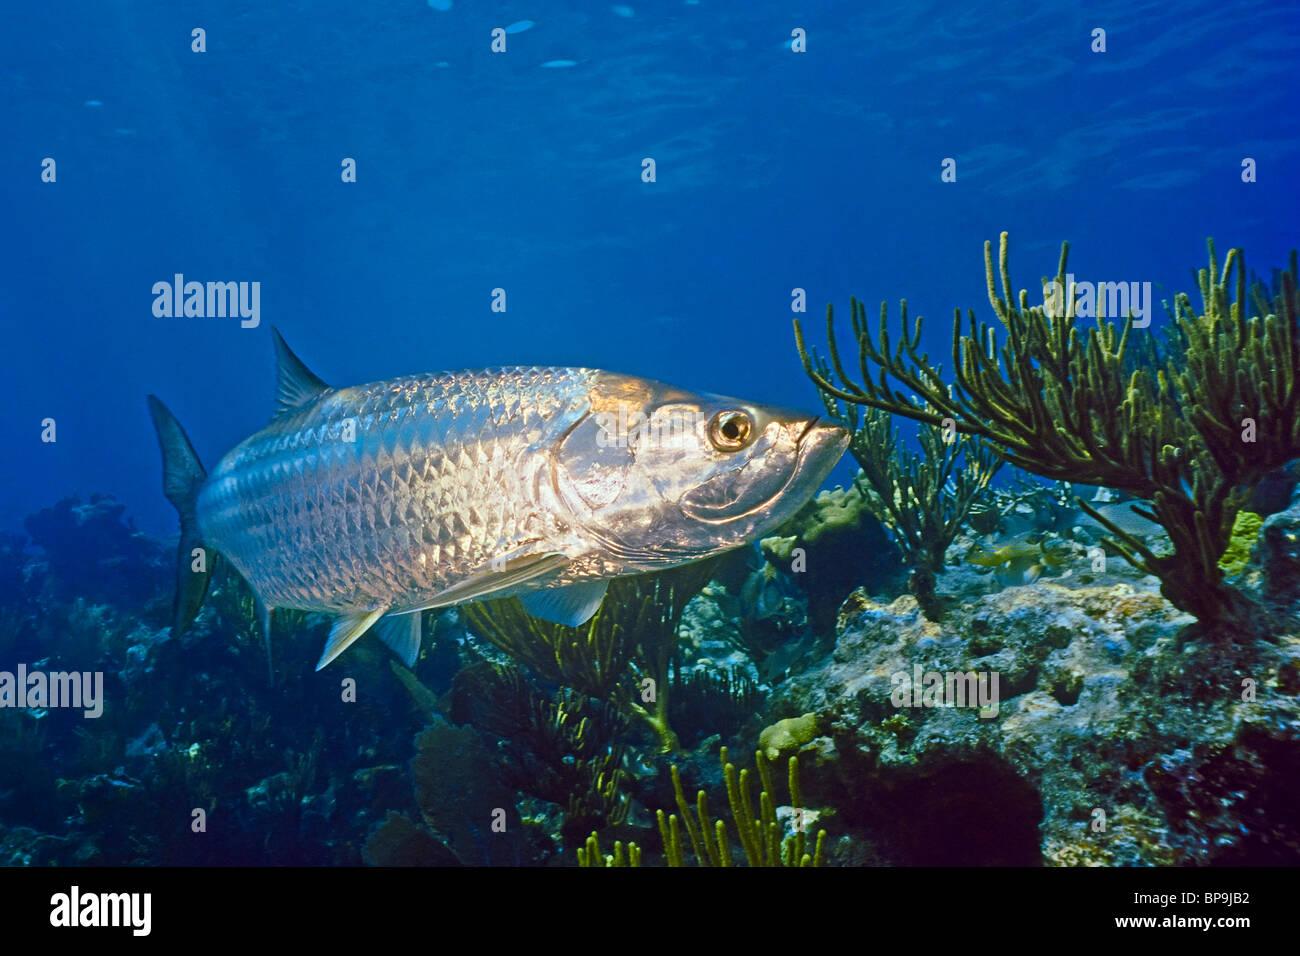 Atlantic tarpon, Megalops atlanticus, swimming over a coral reef in the Florida Keys - Stock Image